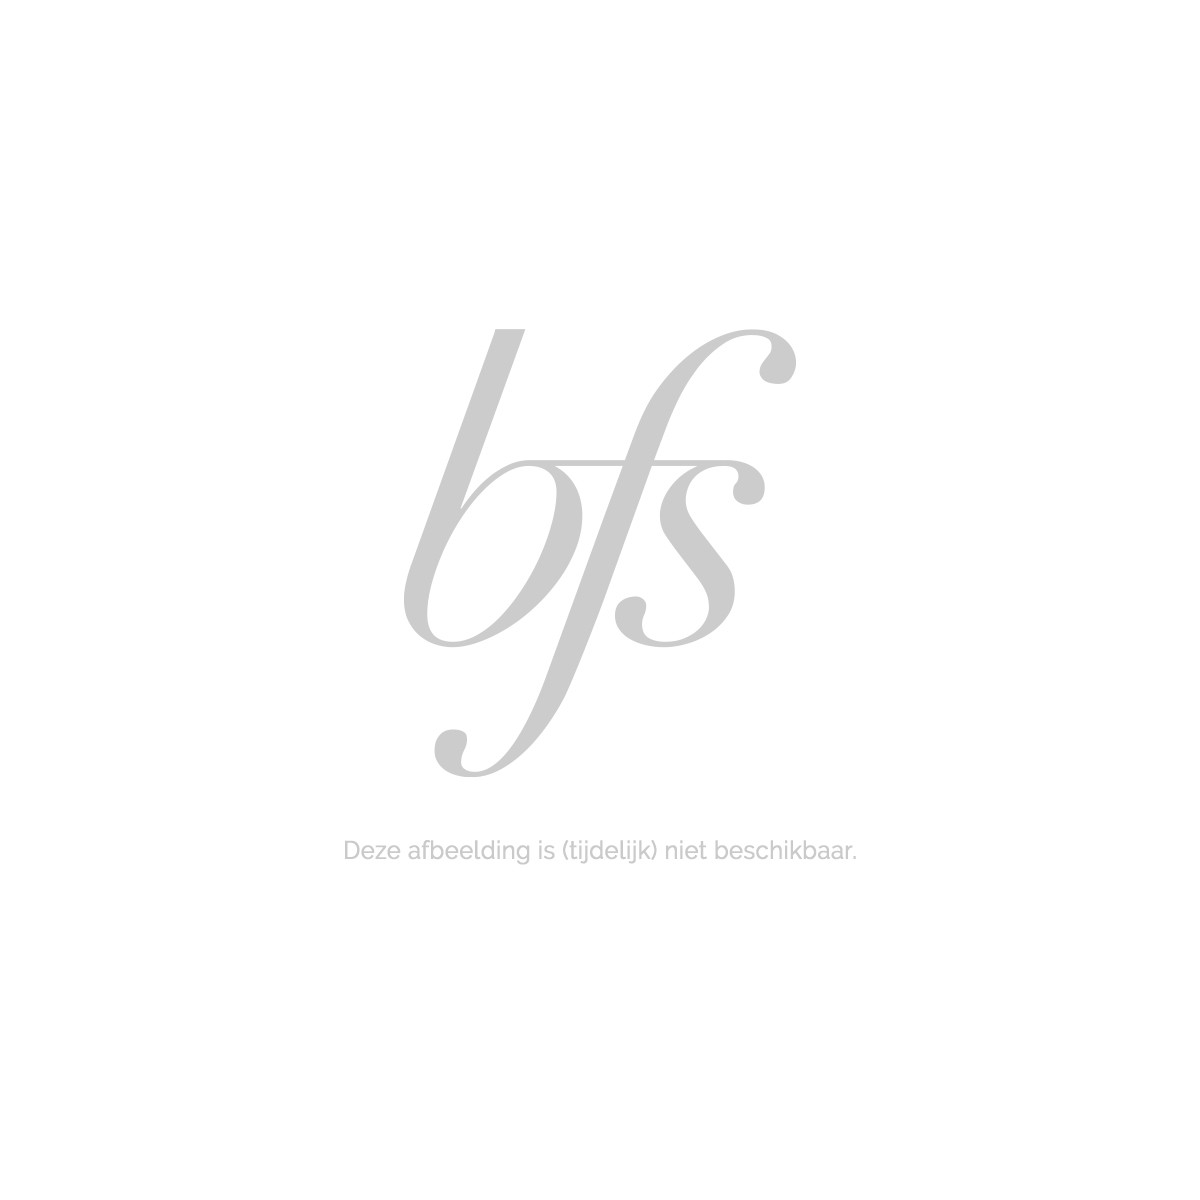 Shiseido Ibuki Protective Moisturizer Spf15 75 Ml